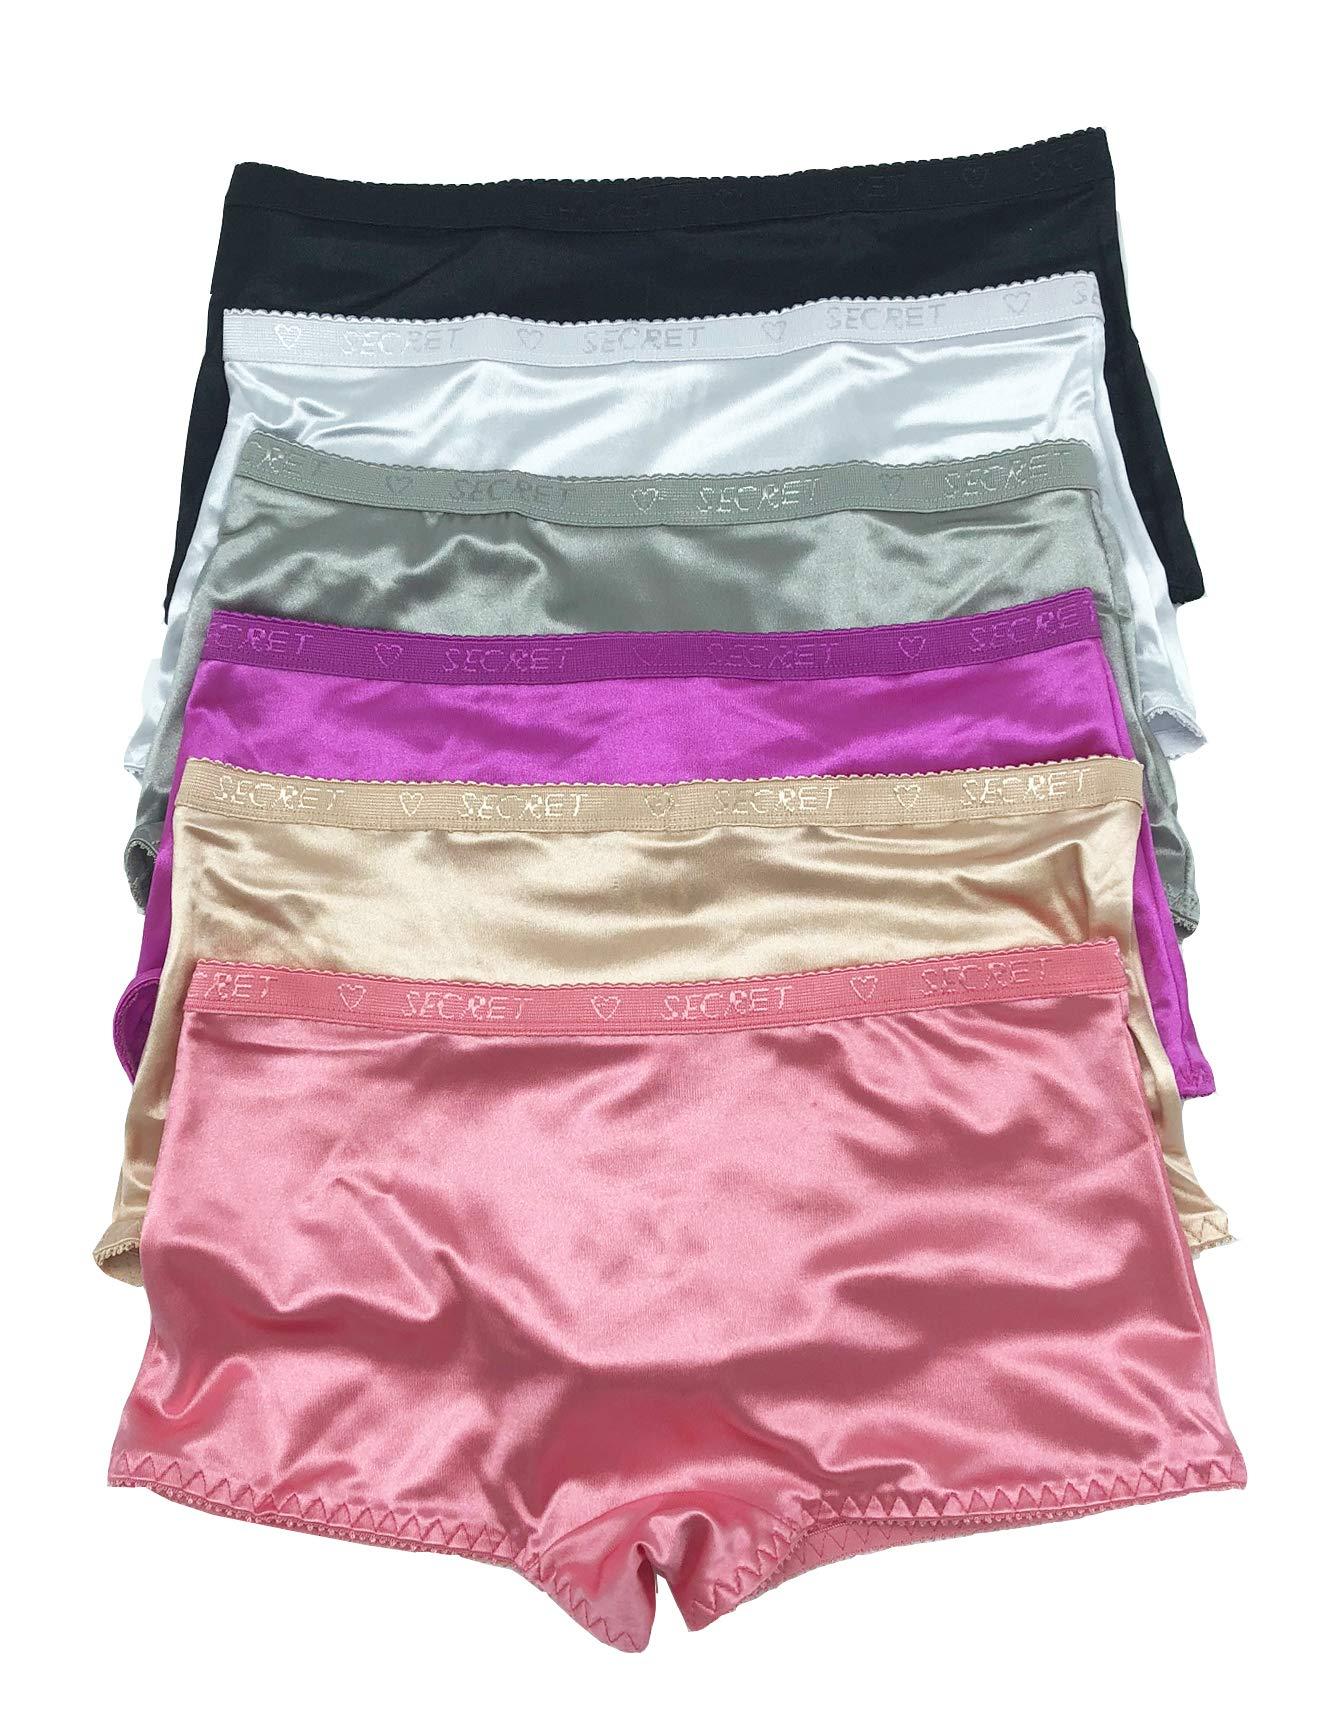 Violas Secret Women Satin Bikini 6 Pack of Plain Satin Shining Underwear